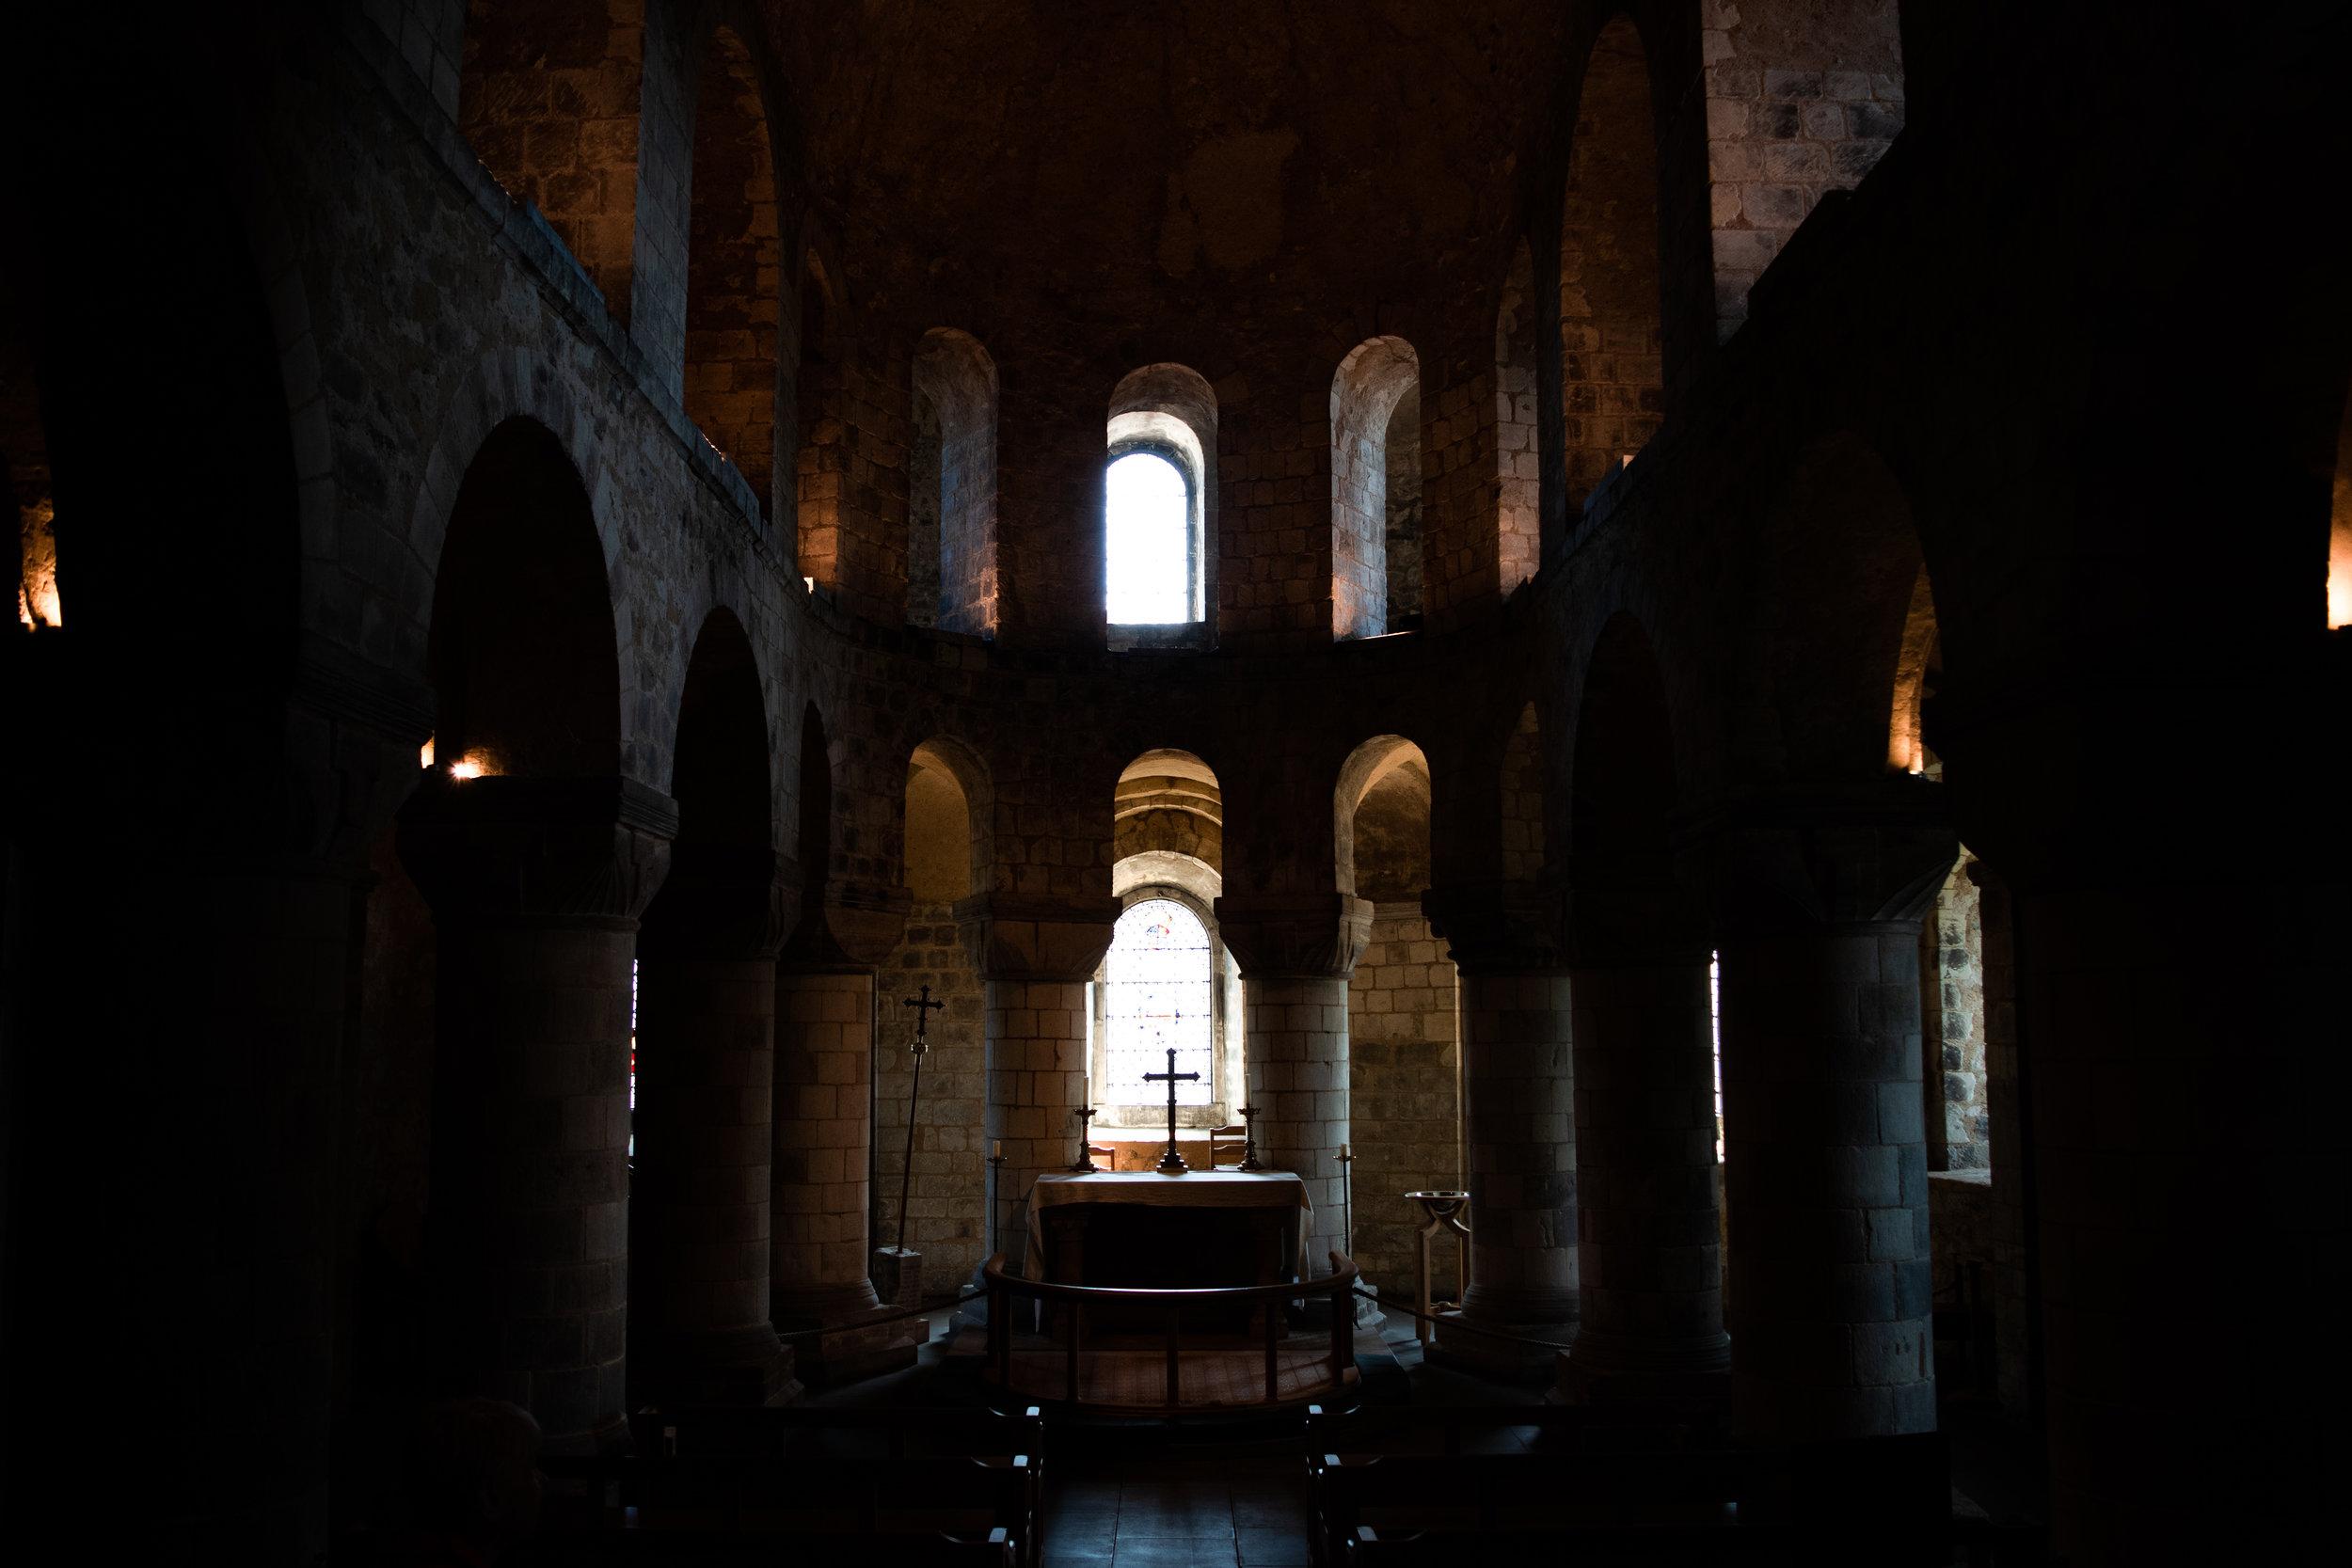 tower of london church jpg.jpg